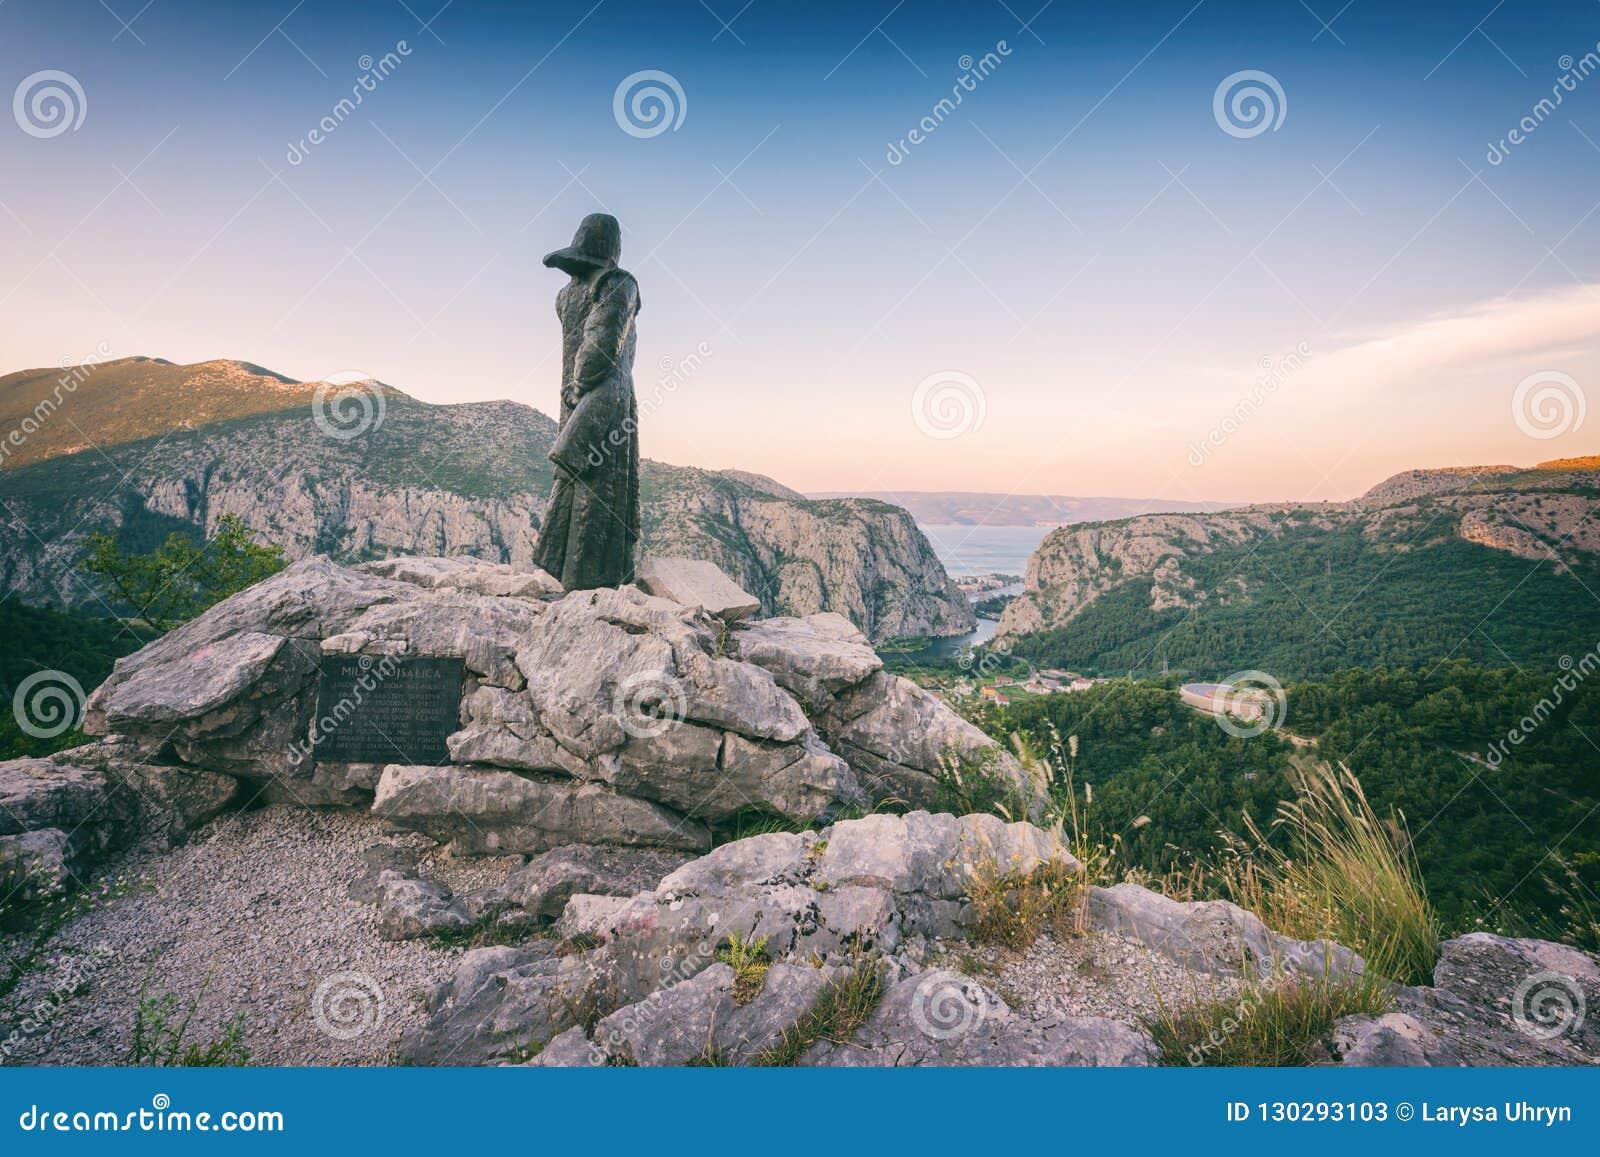 Estatua de Mila Gojsalic legendaria encima de una montaña rocosa cerca de Omis, Dalmacia, Croacia